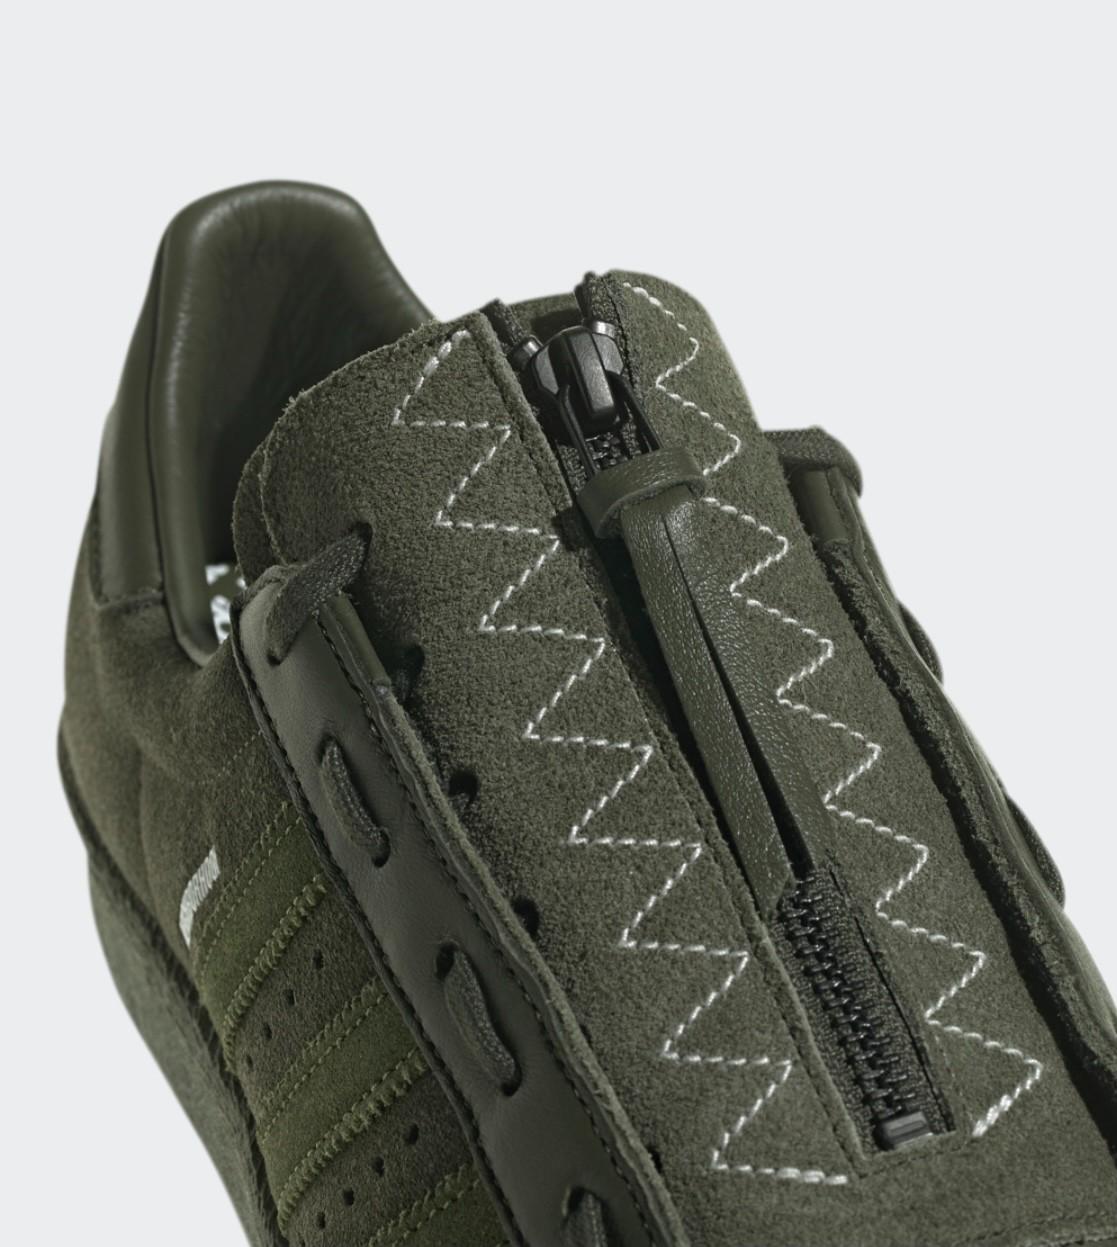 NEIGHBORHOOD,NBHD,adidas Super   「鞋子带盖」又来了!全新 NBHD x adidas Superstar 现已登场!